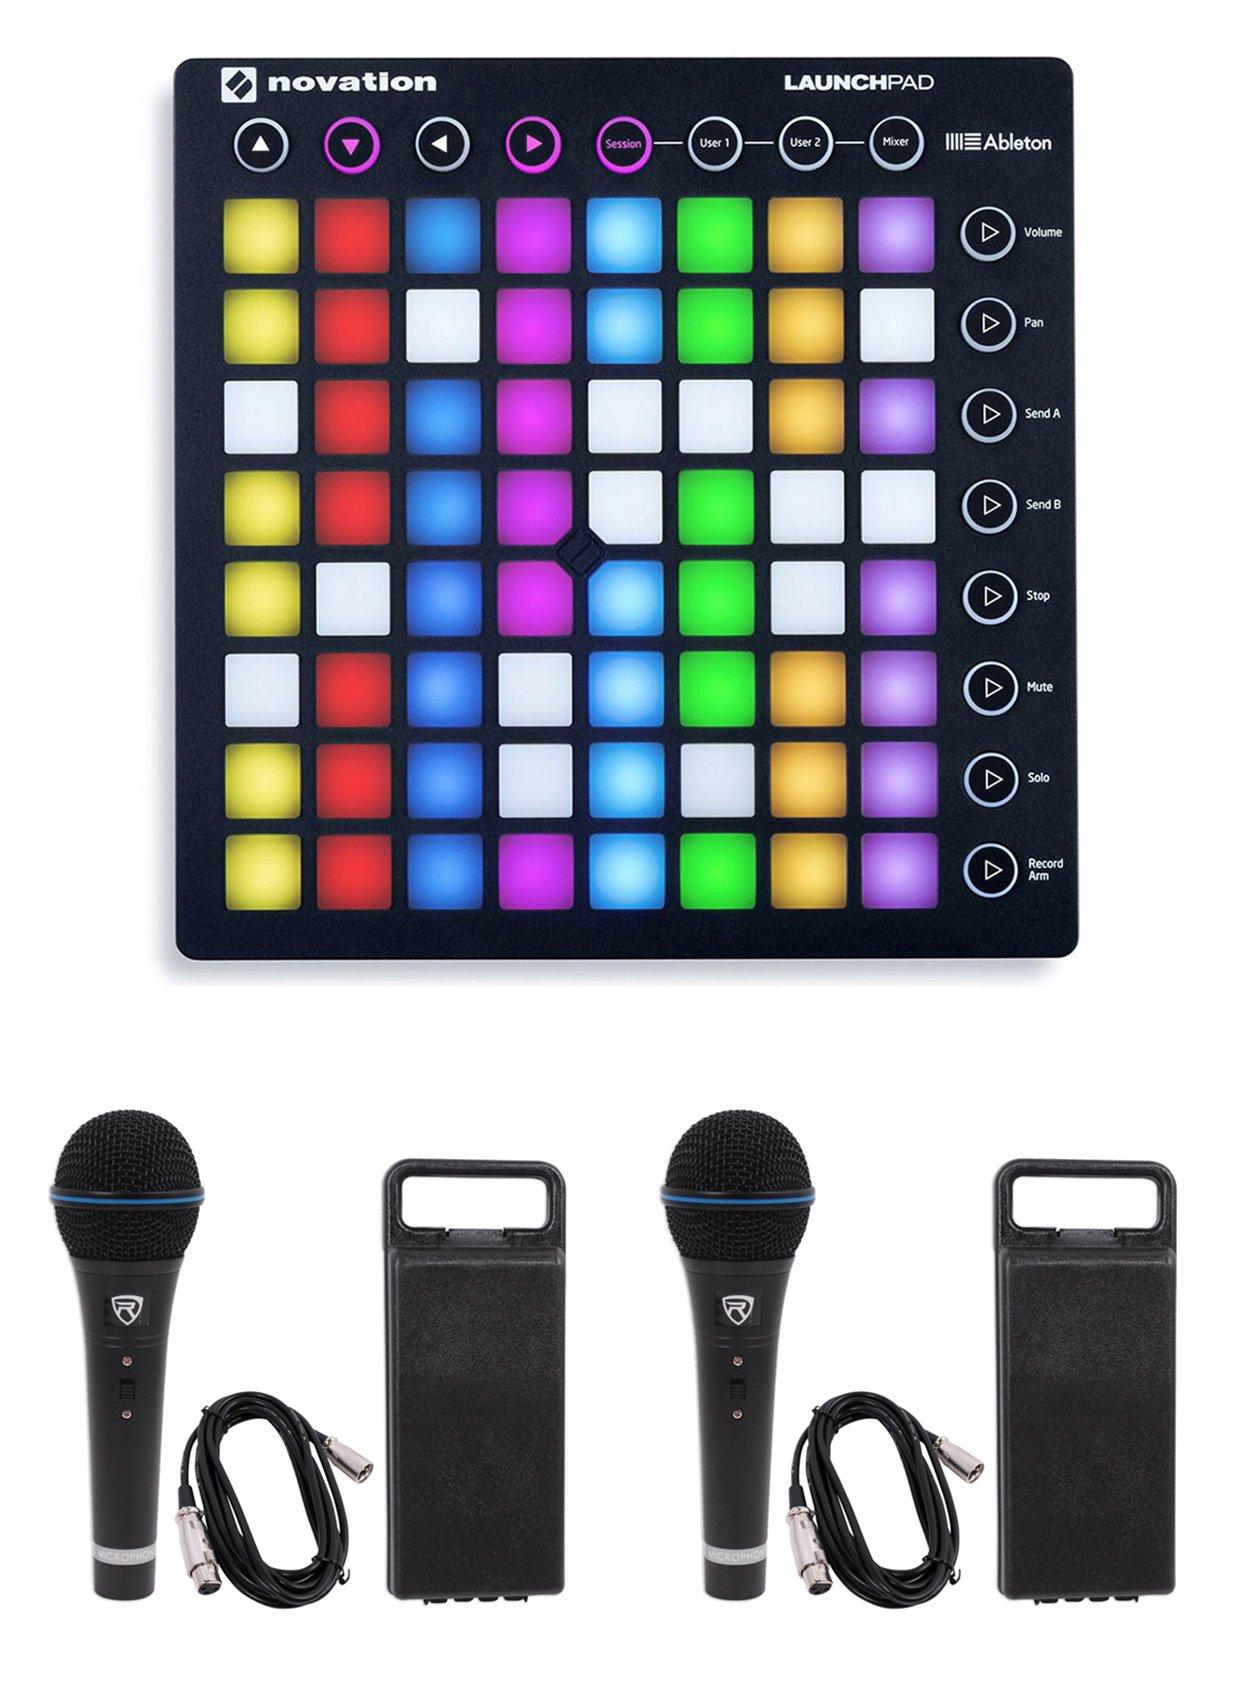 Novation LAUNCHPAD S MK2 MKII MIDI USB RGB DJ Controller Pad+(2) Microphones by Novation